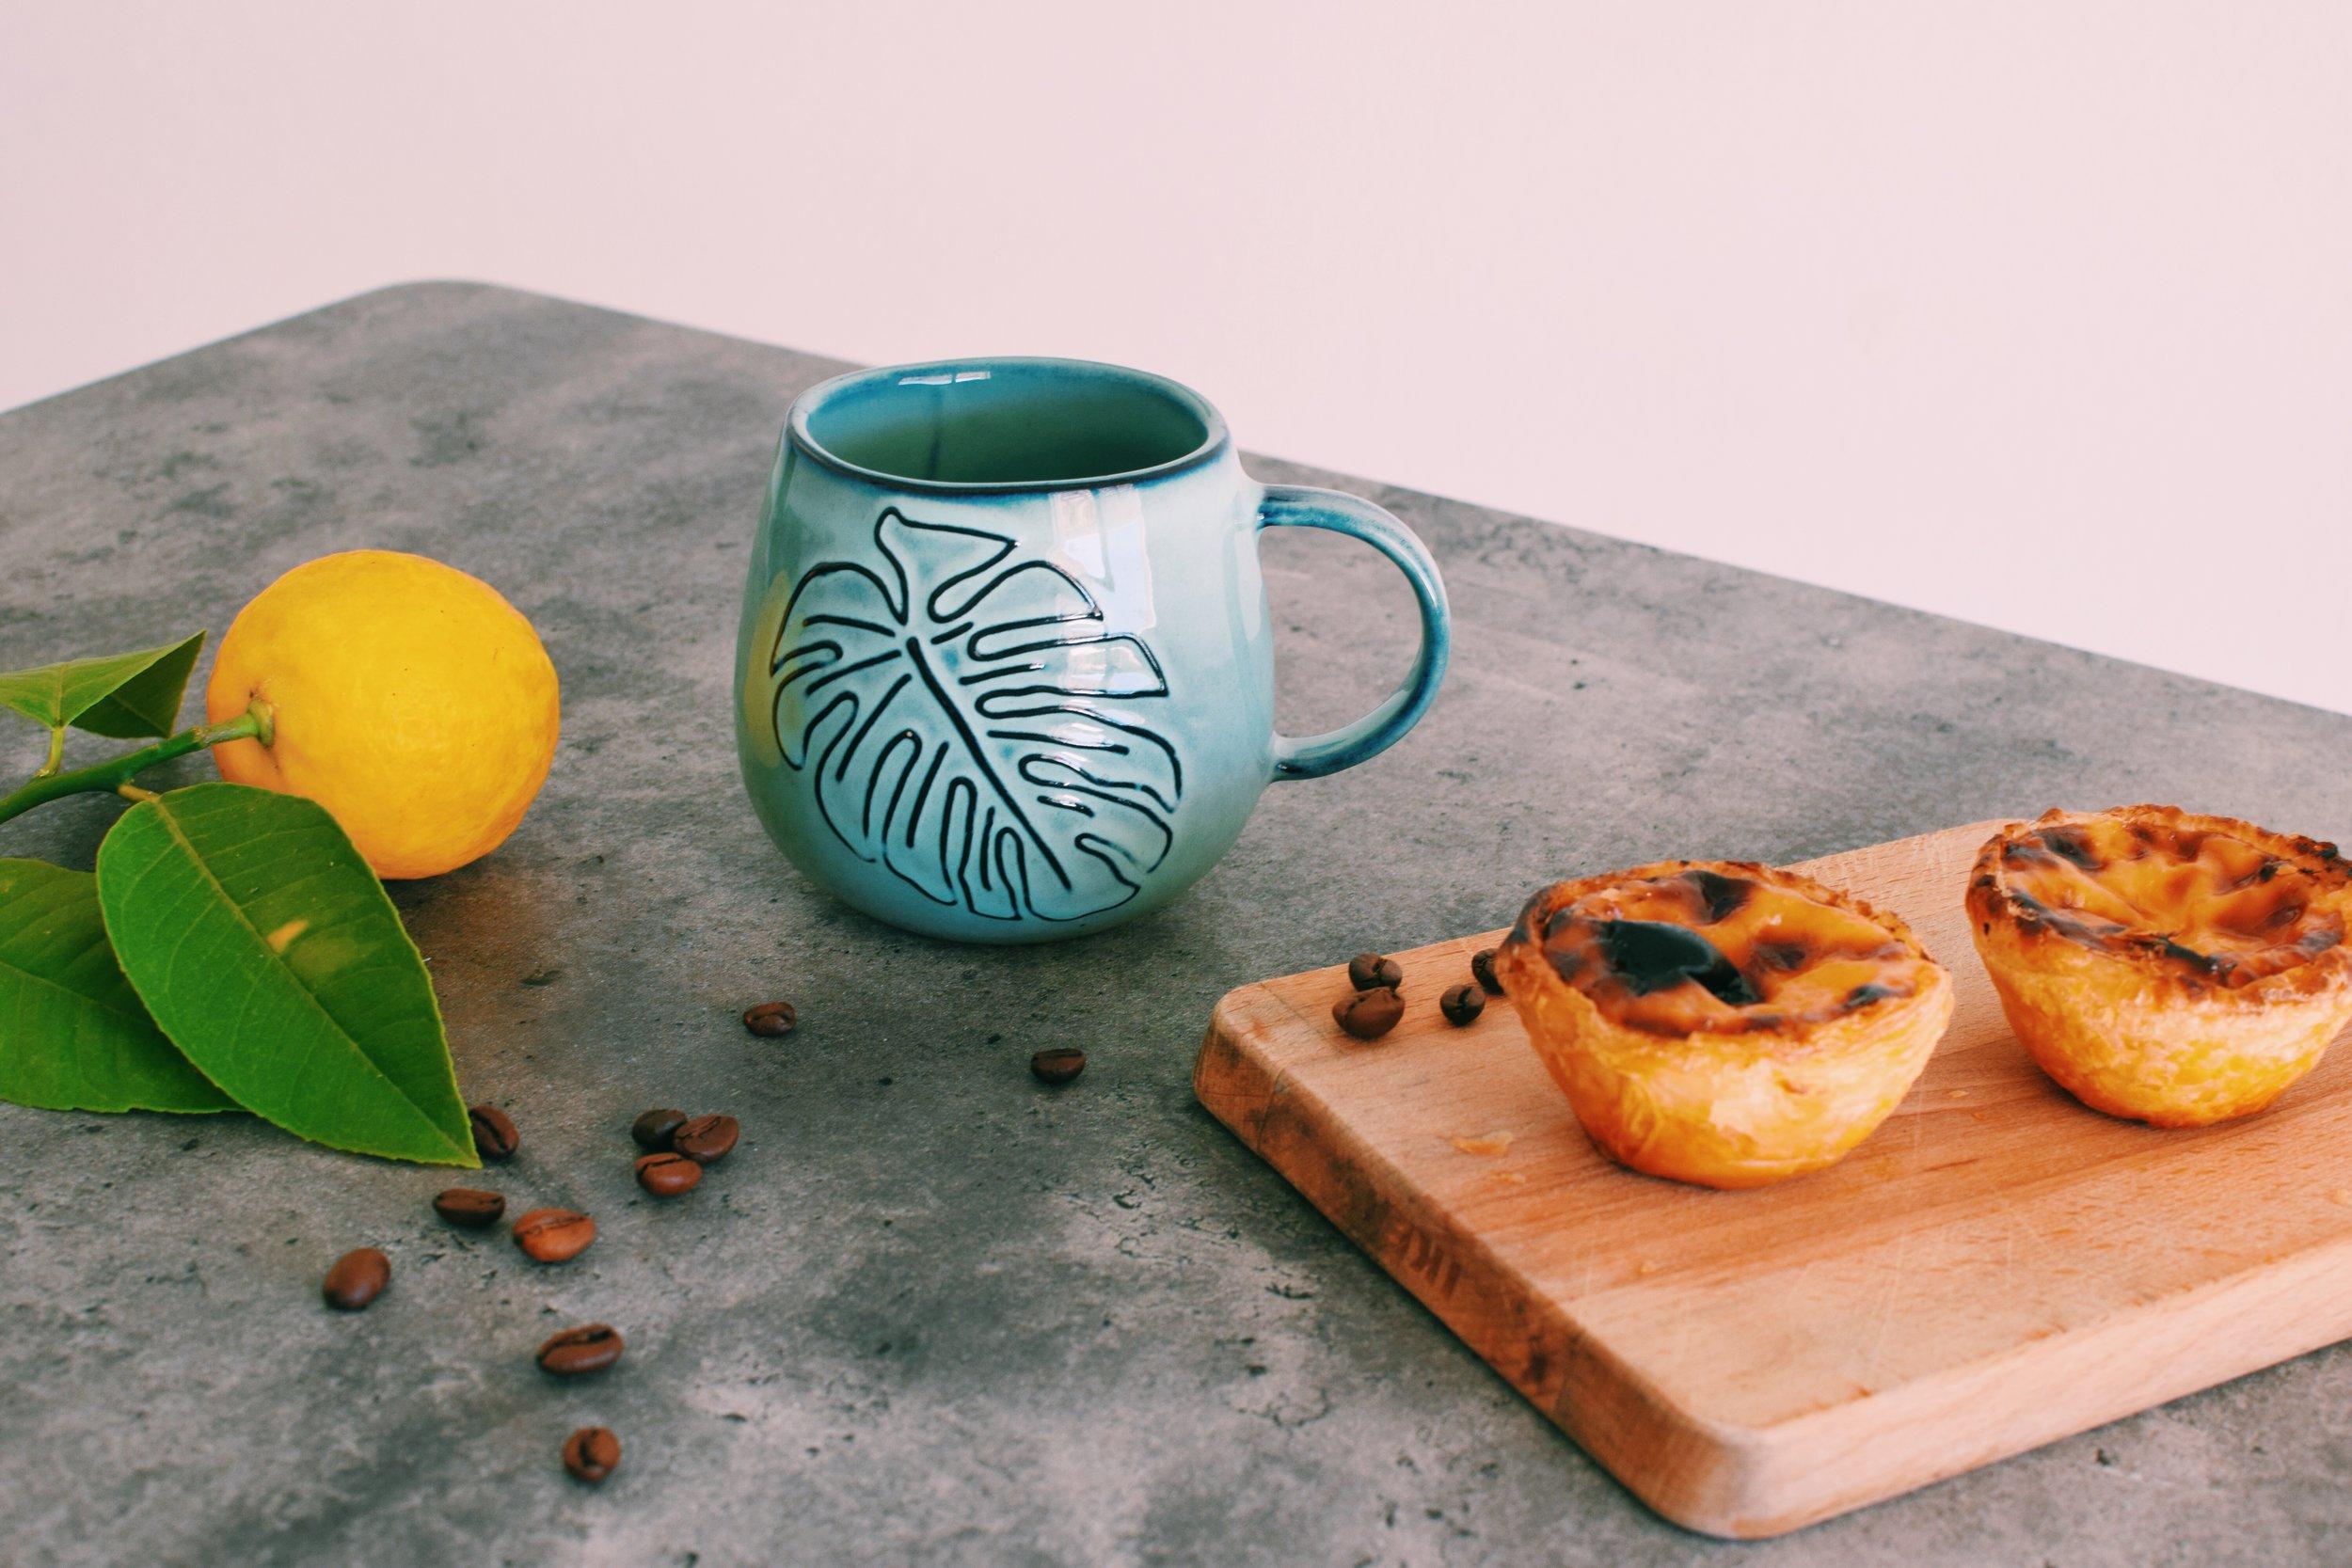 Monstera Ceramic Mug handmade in Portugal | Soi 55 Home